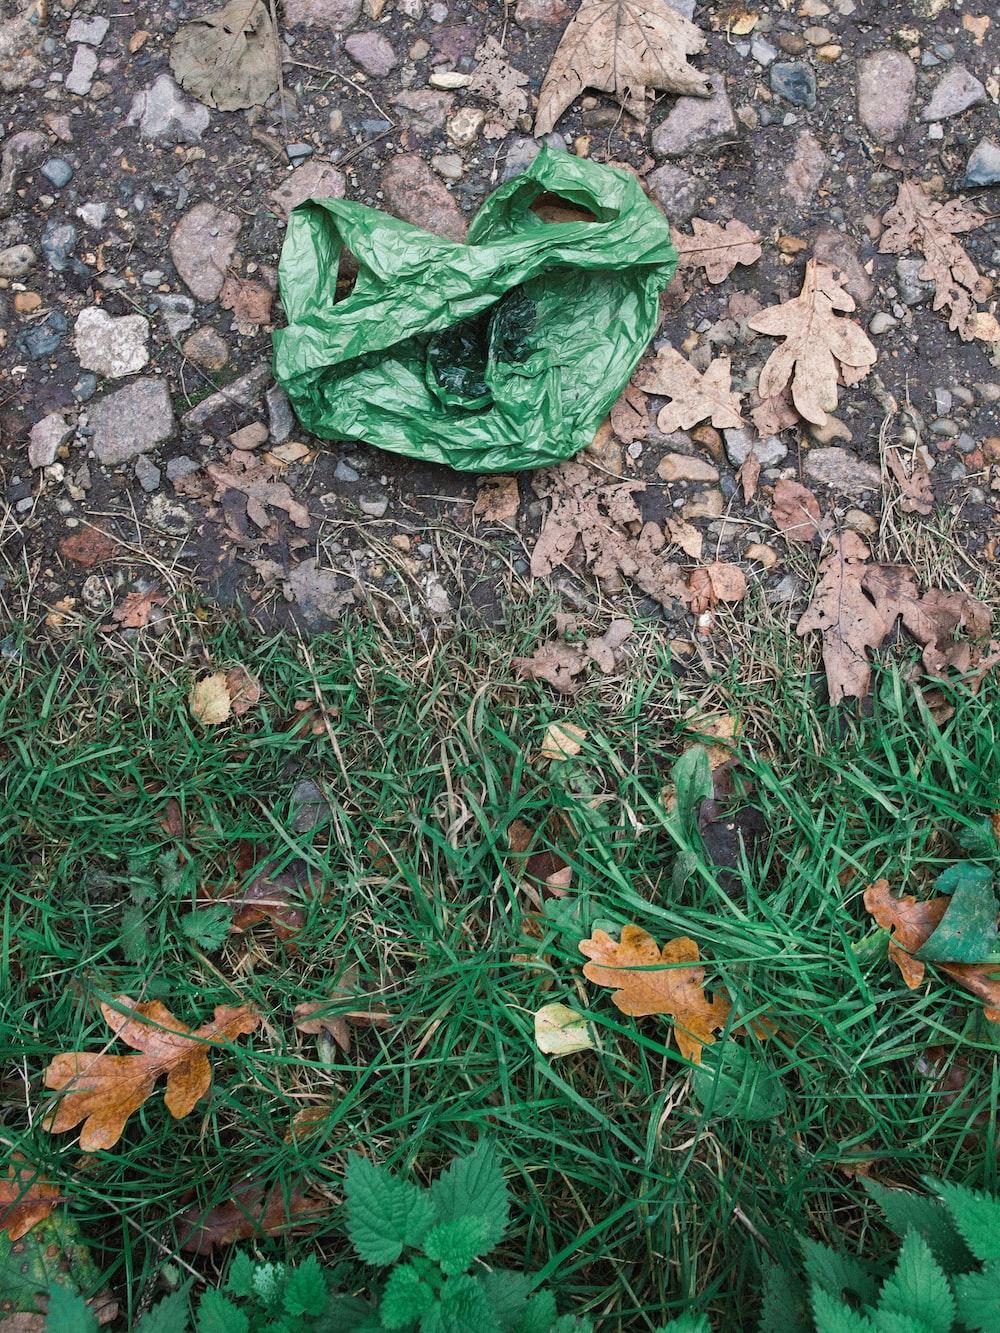 green plastic bag on brown dried leaves